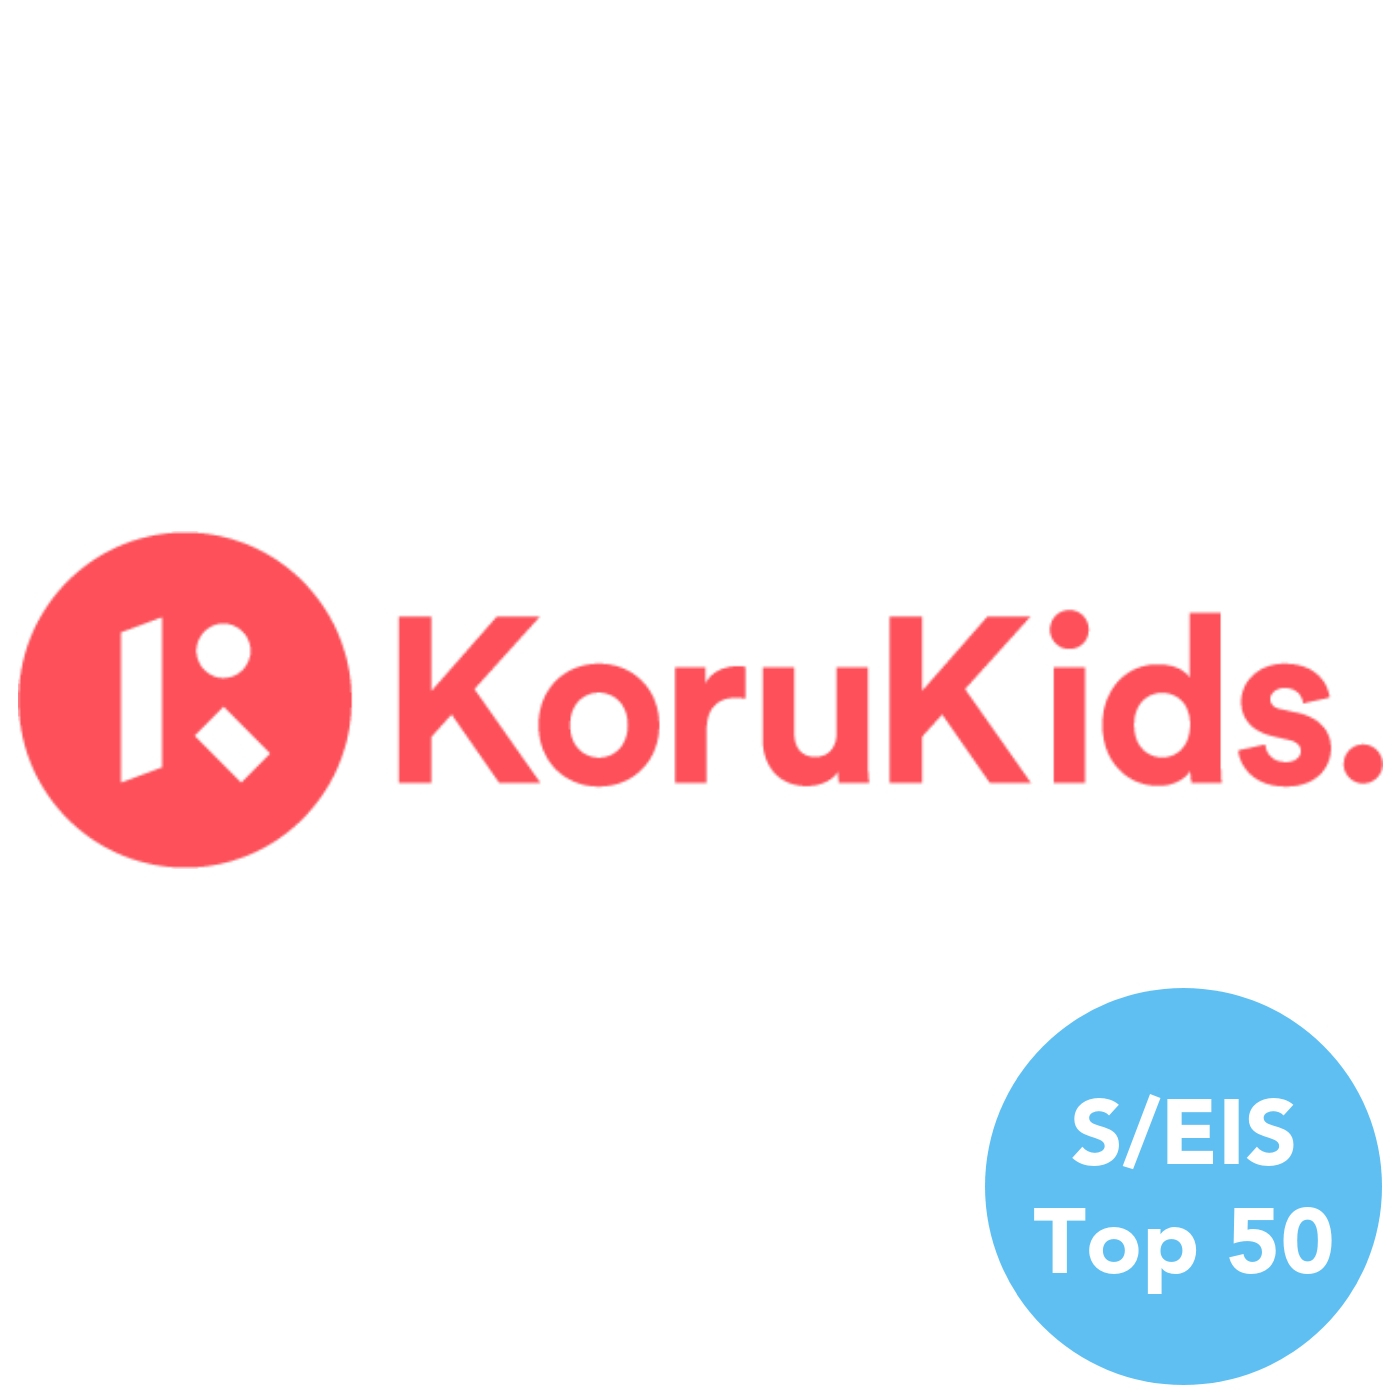 Koru Kids | S/EIS Top 50